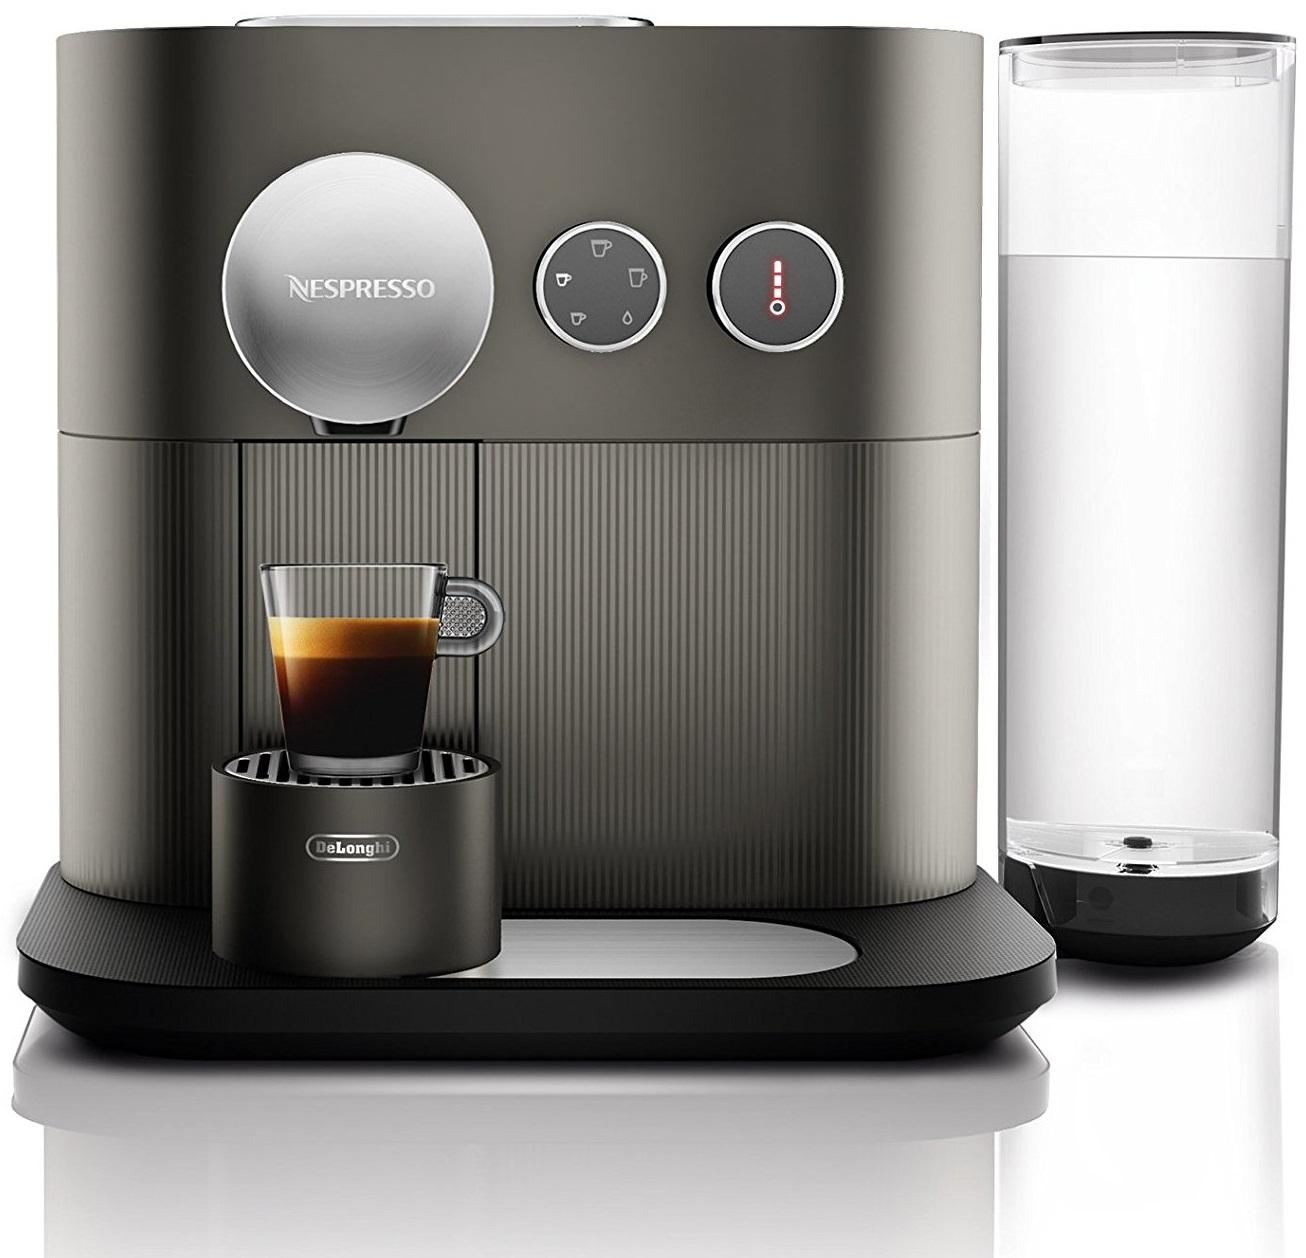 nespresso-expert.jpg